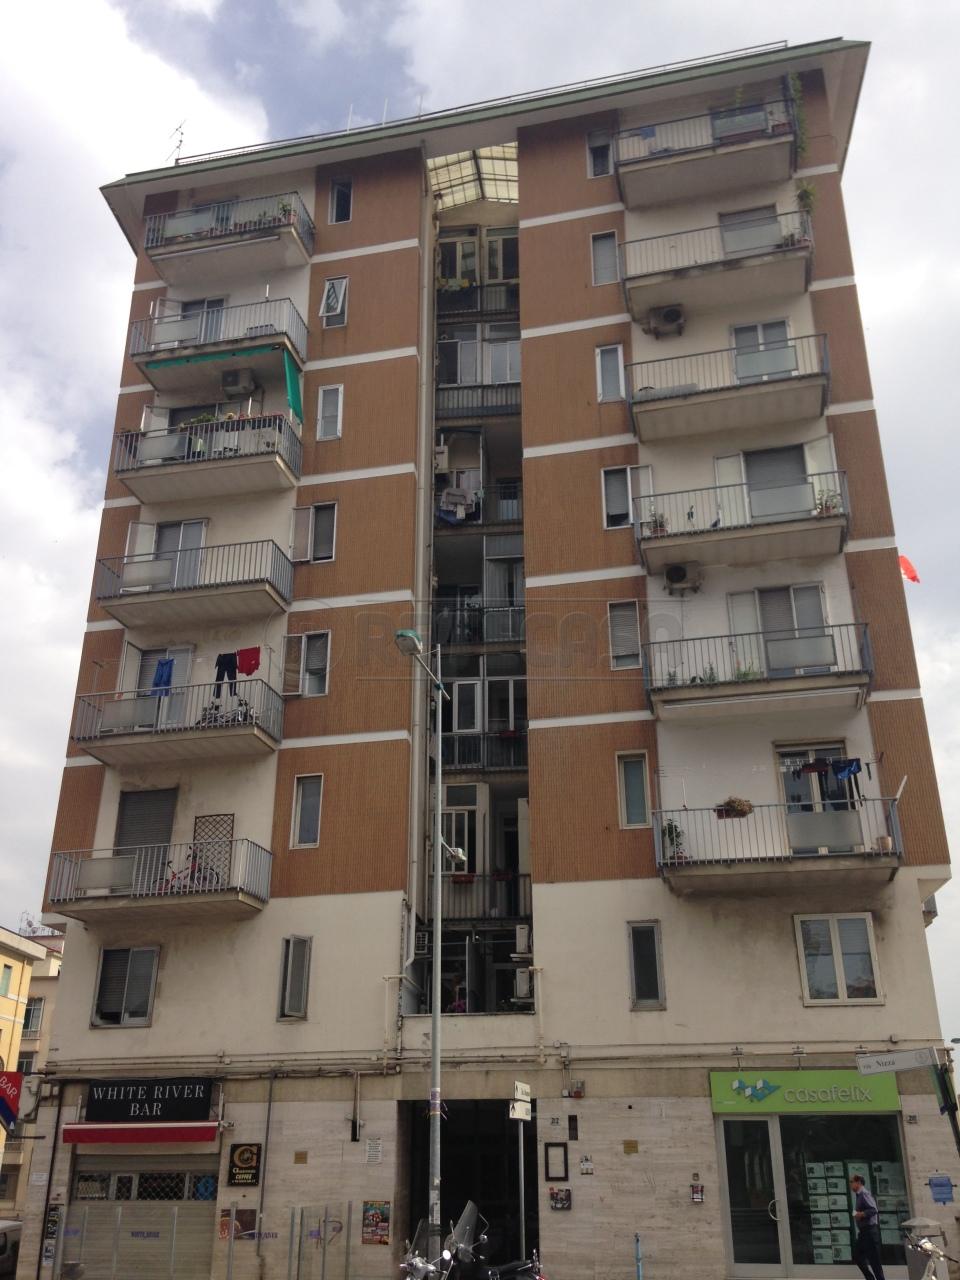 Bilocale Salerno Via Nizza 212 1